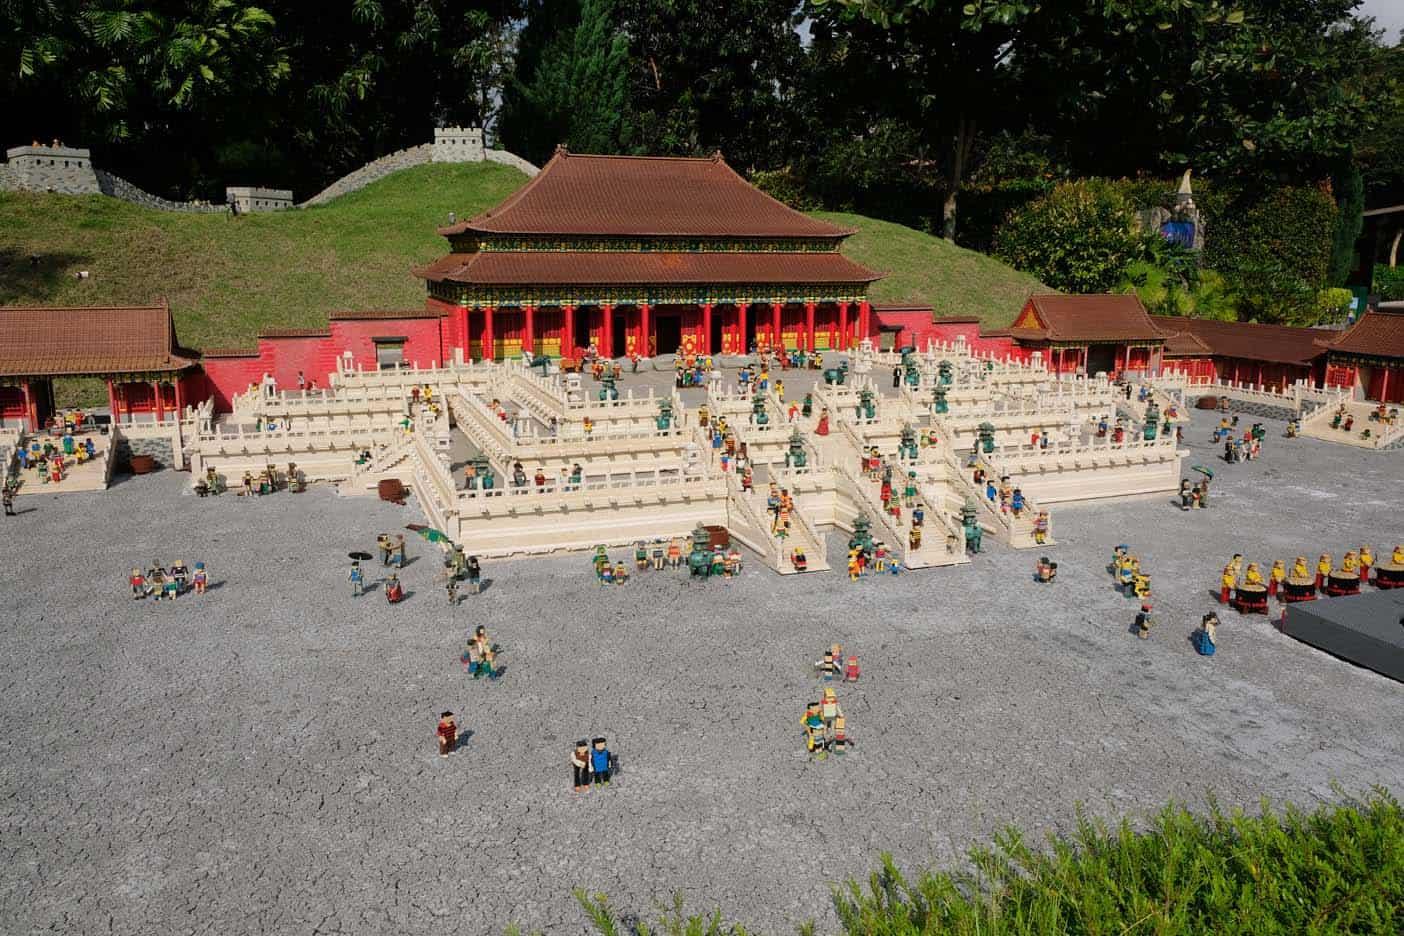 Legoland Maleisië pretpark